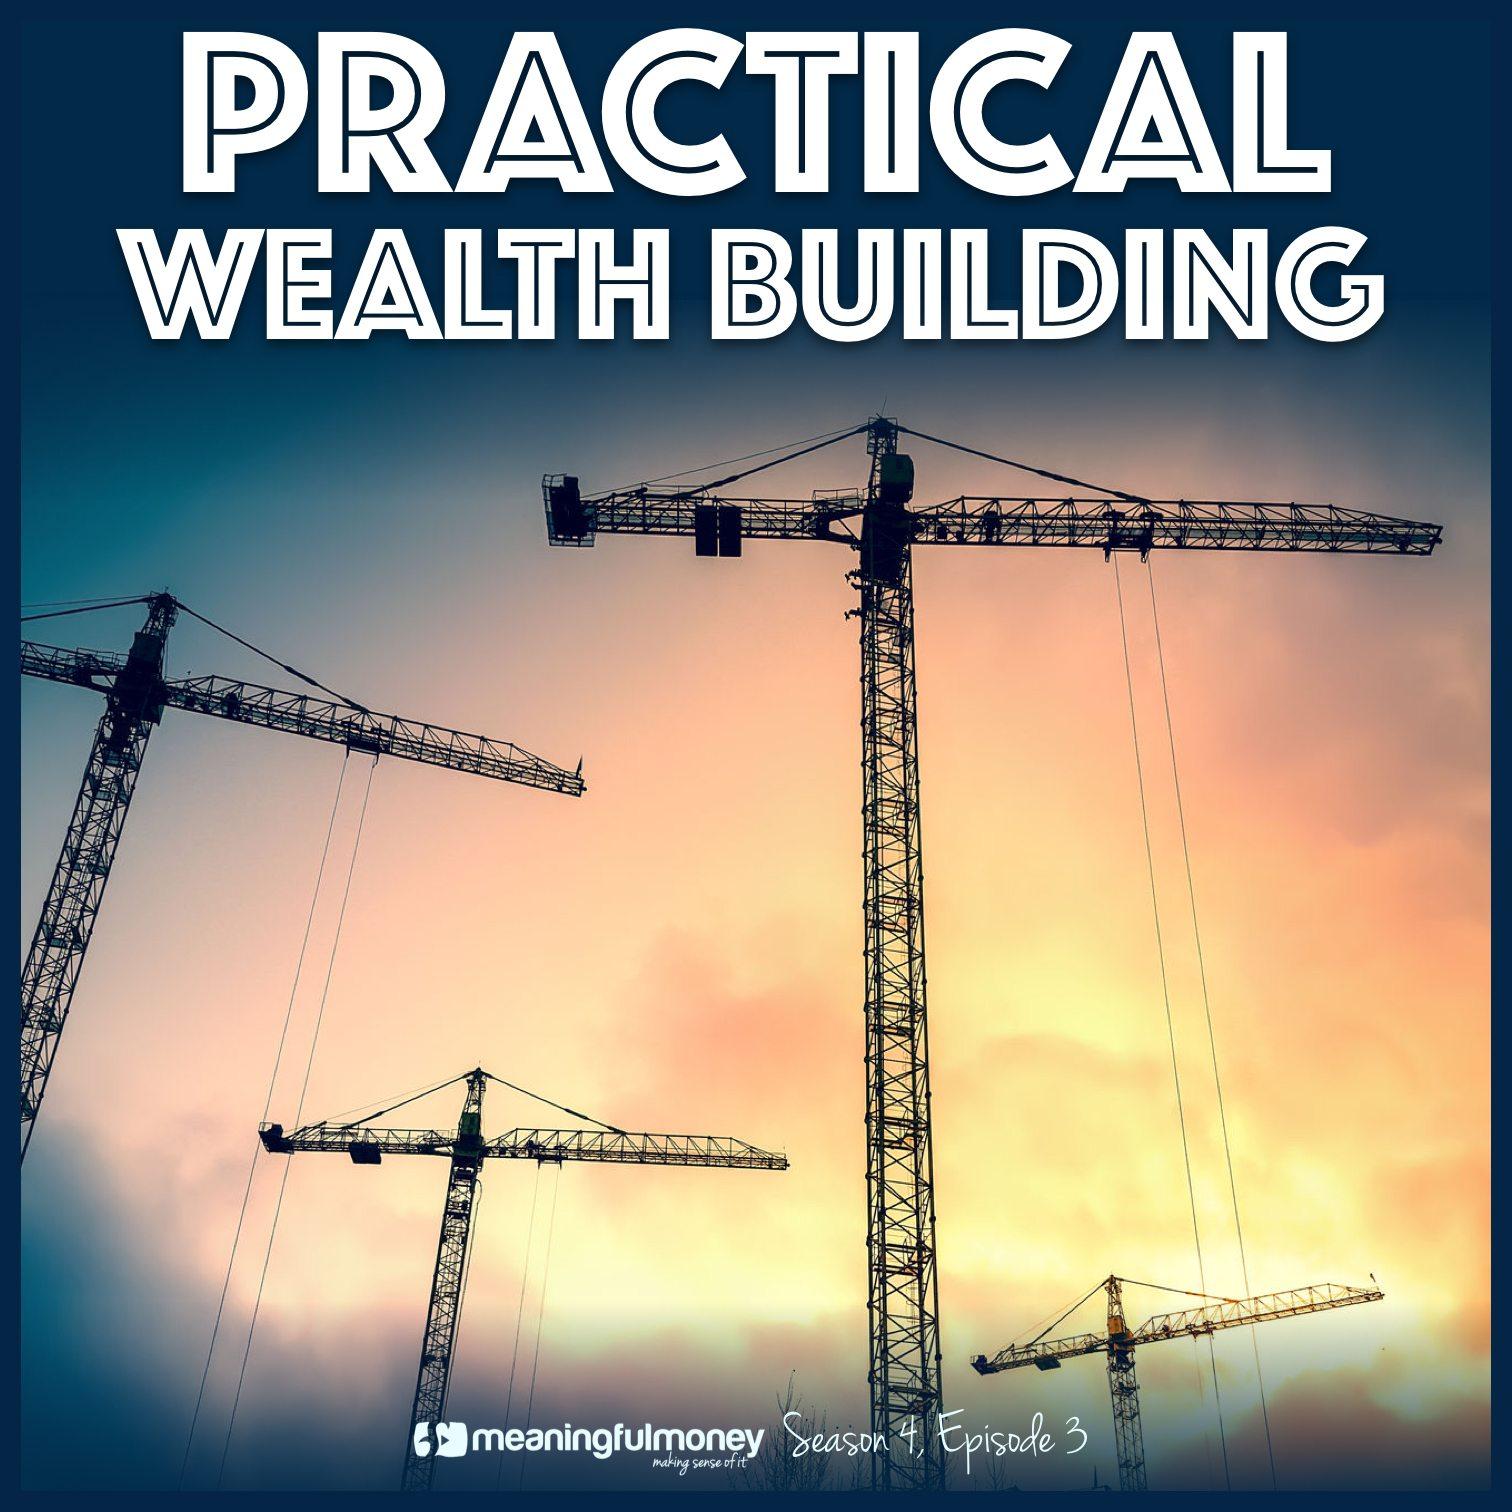 Practical Wealth Building – Season 4, Episode 3